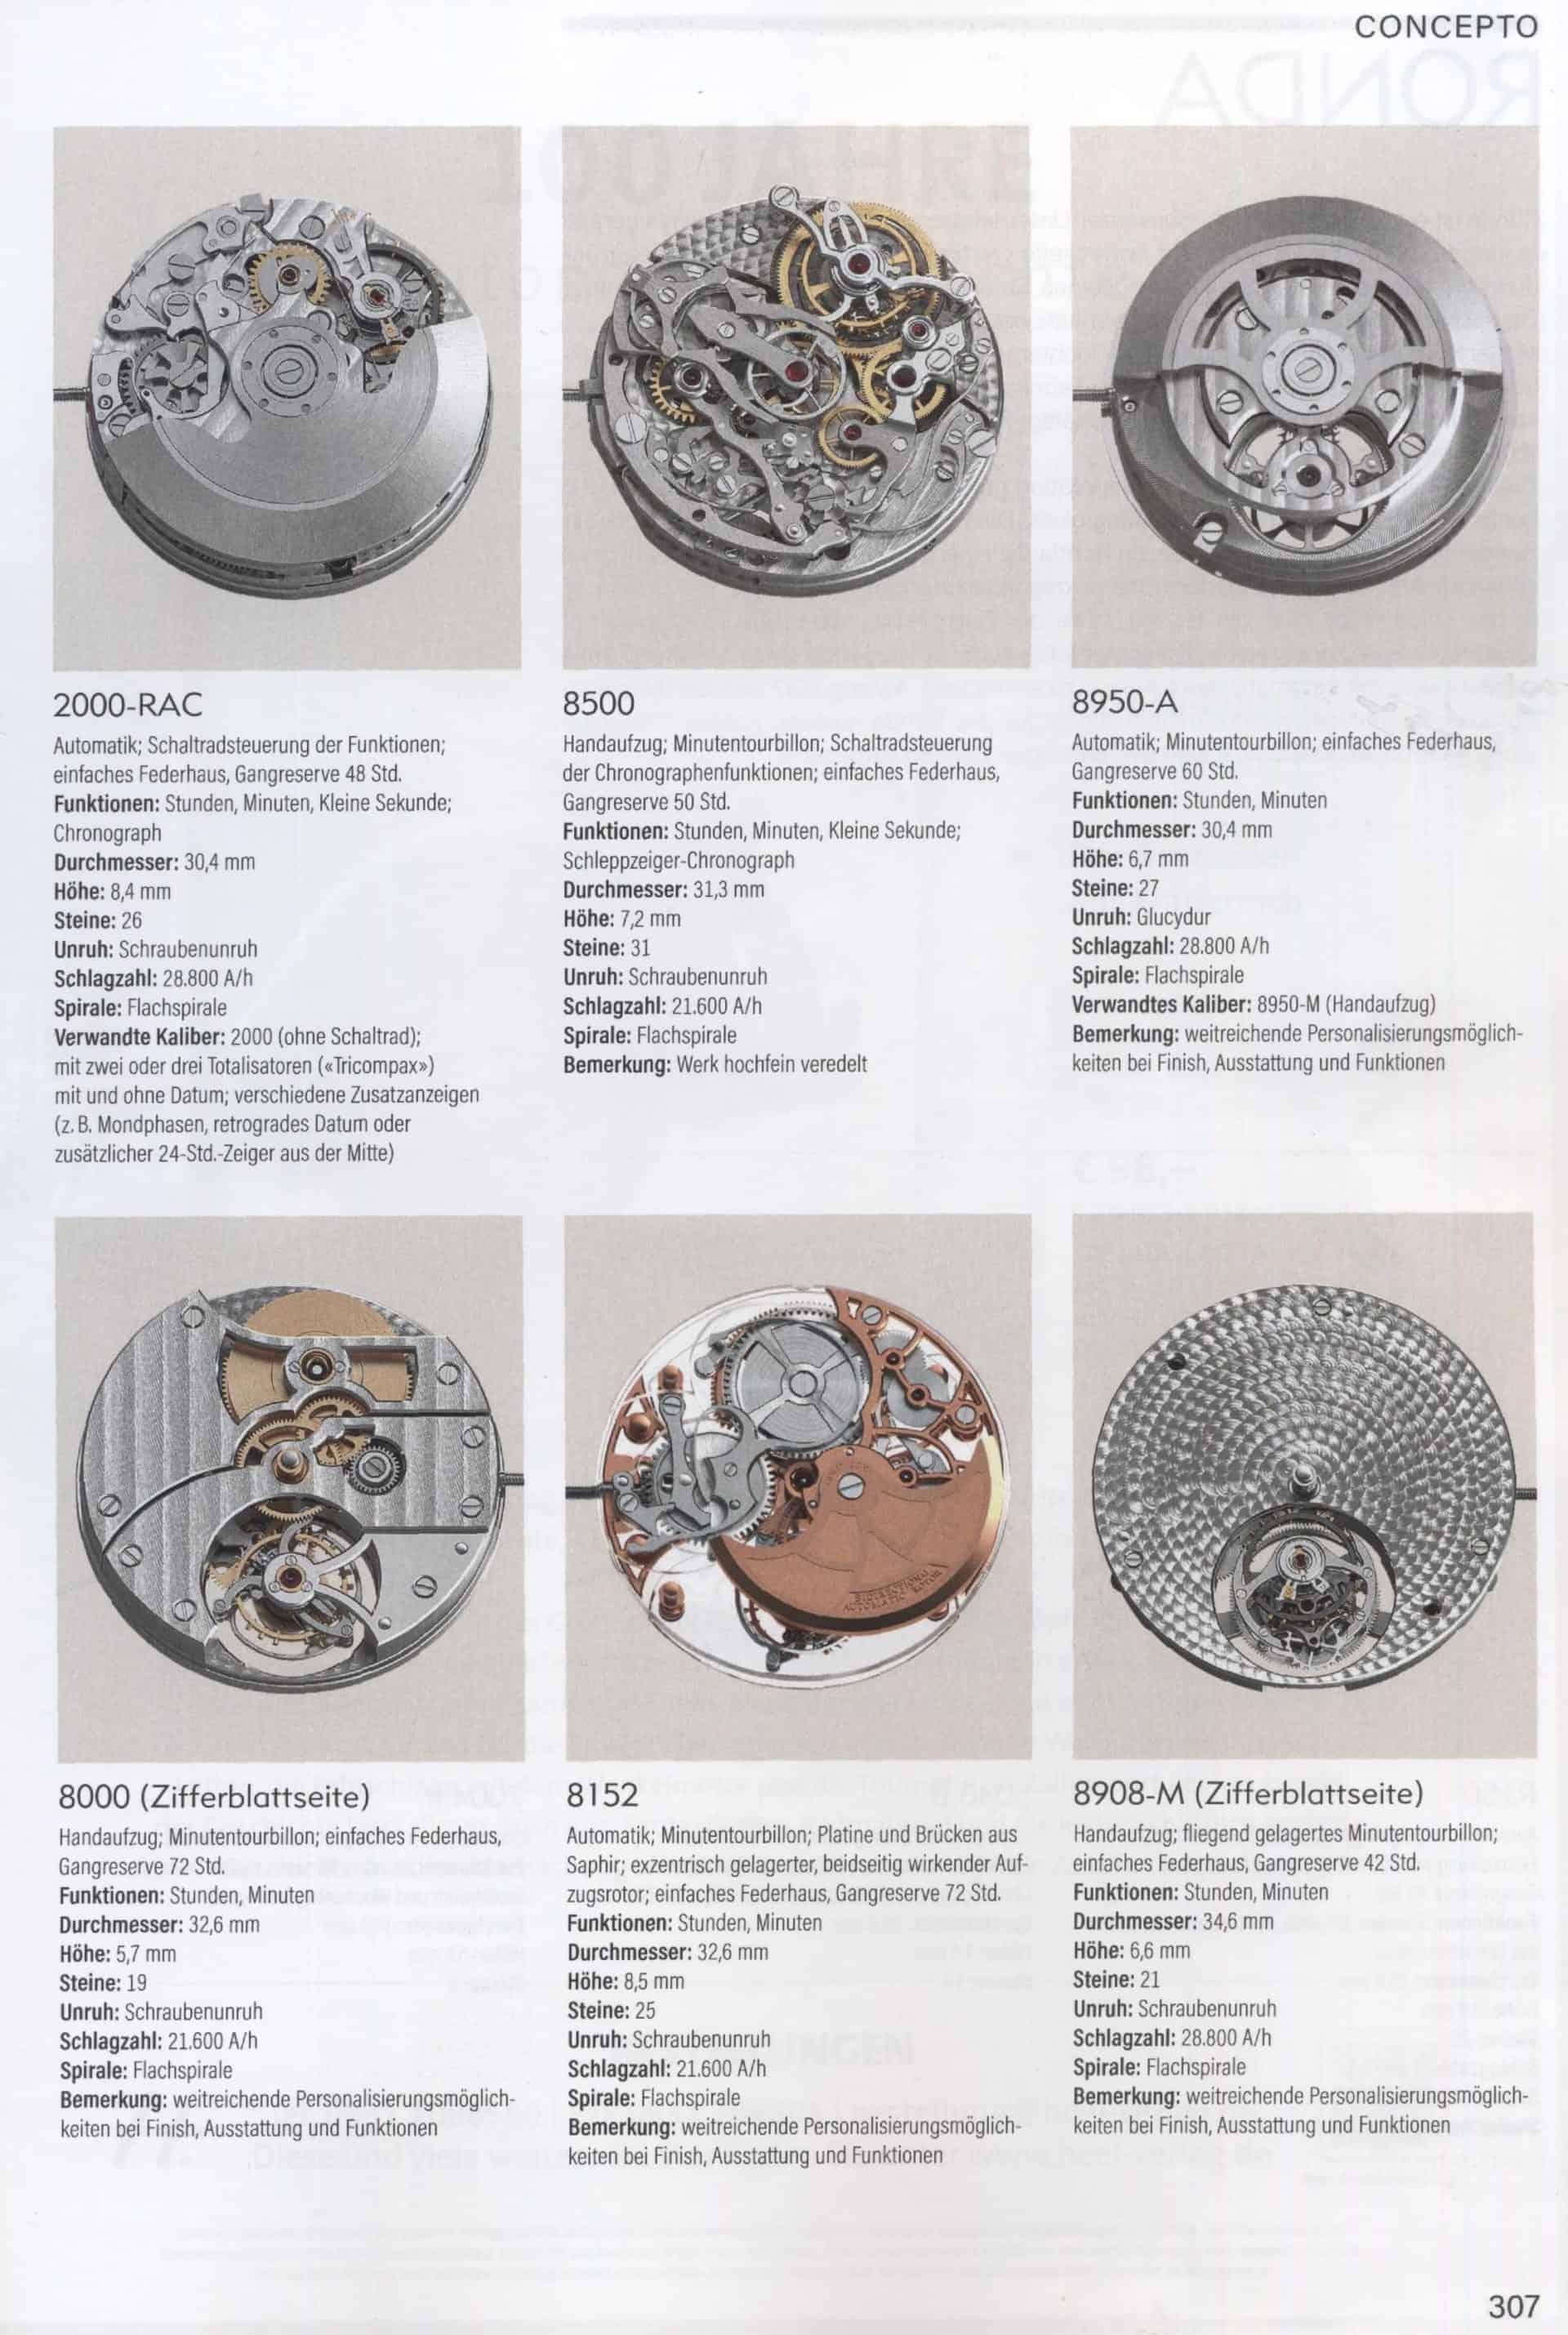 Armbanduhren Katalog Heel 2019 Concepto